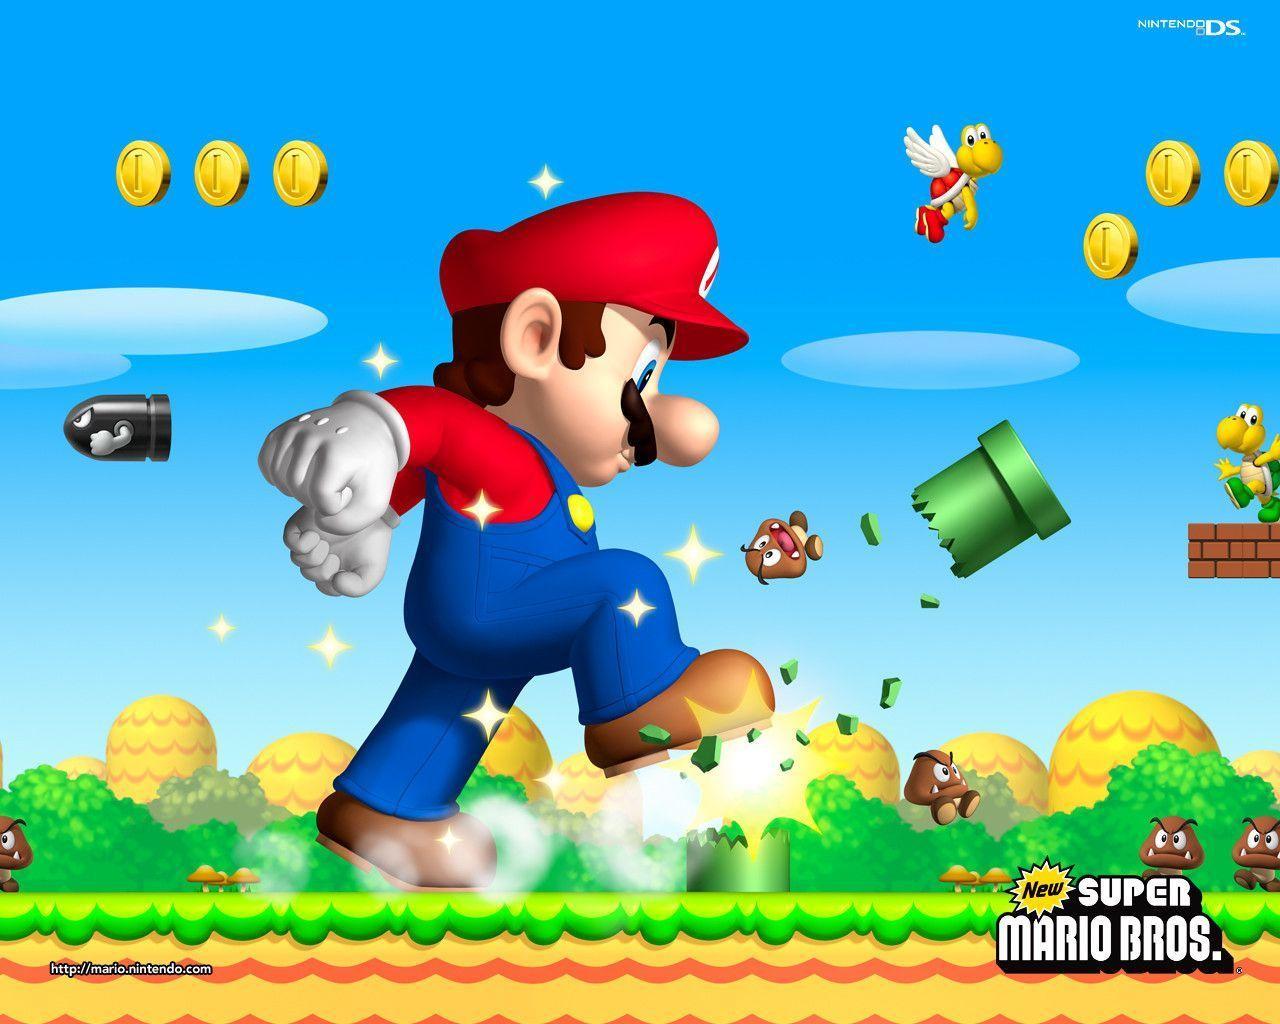 Mario Wallpapers - Download Super Mario Wallpapers